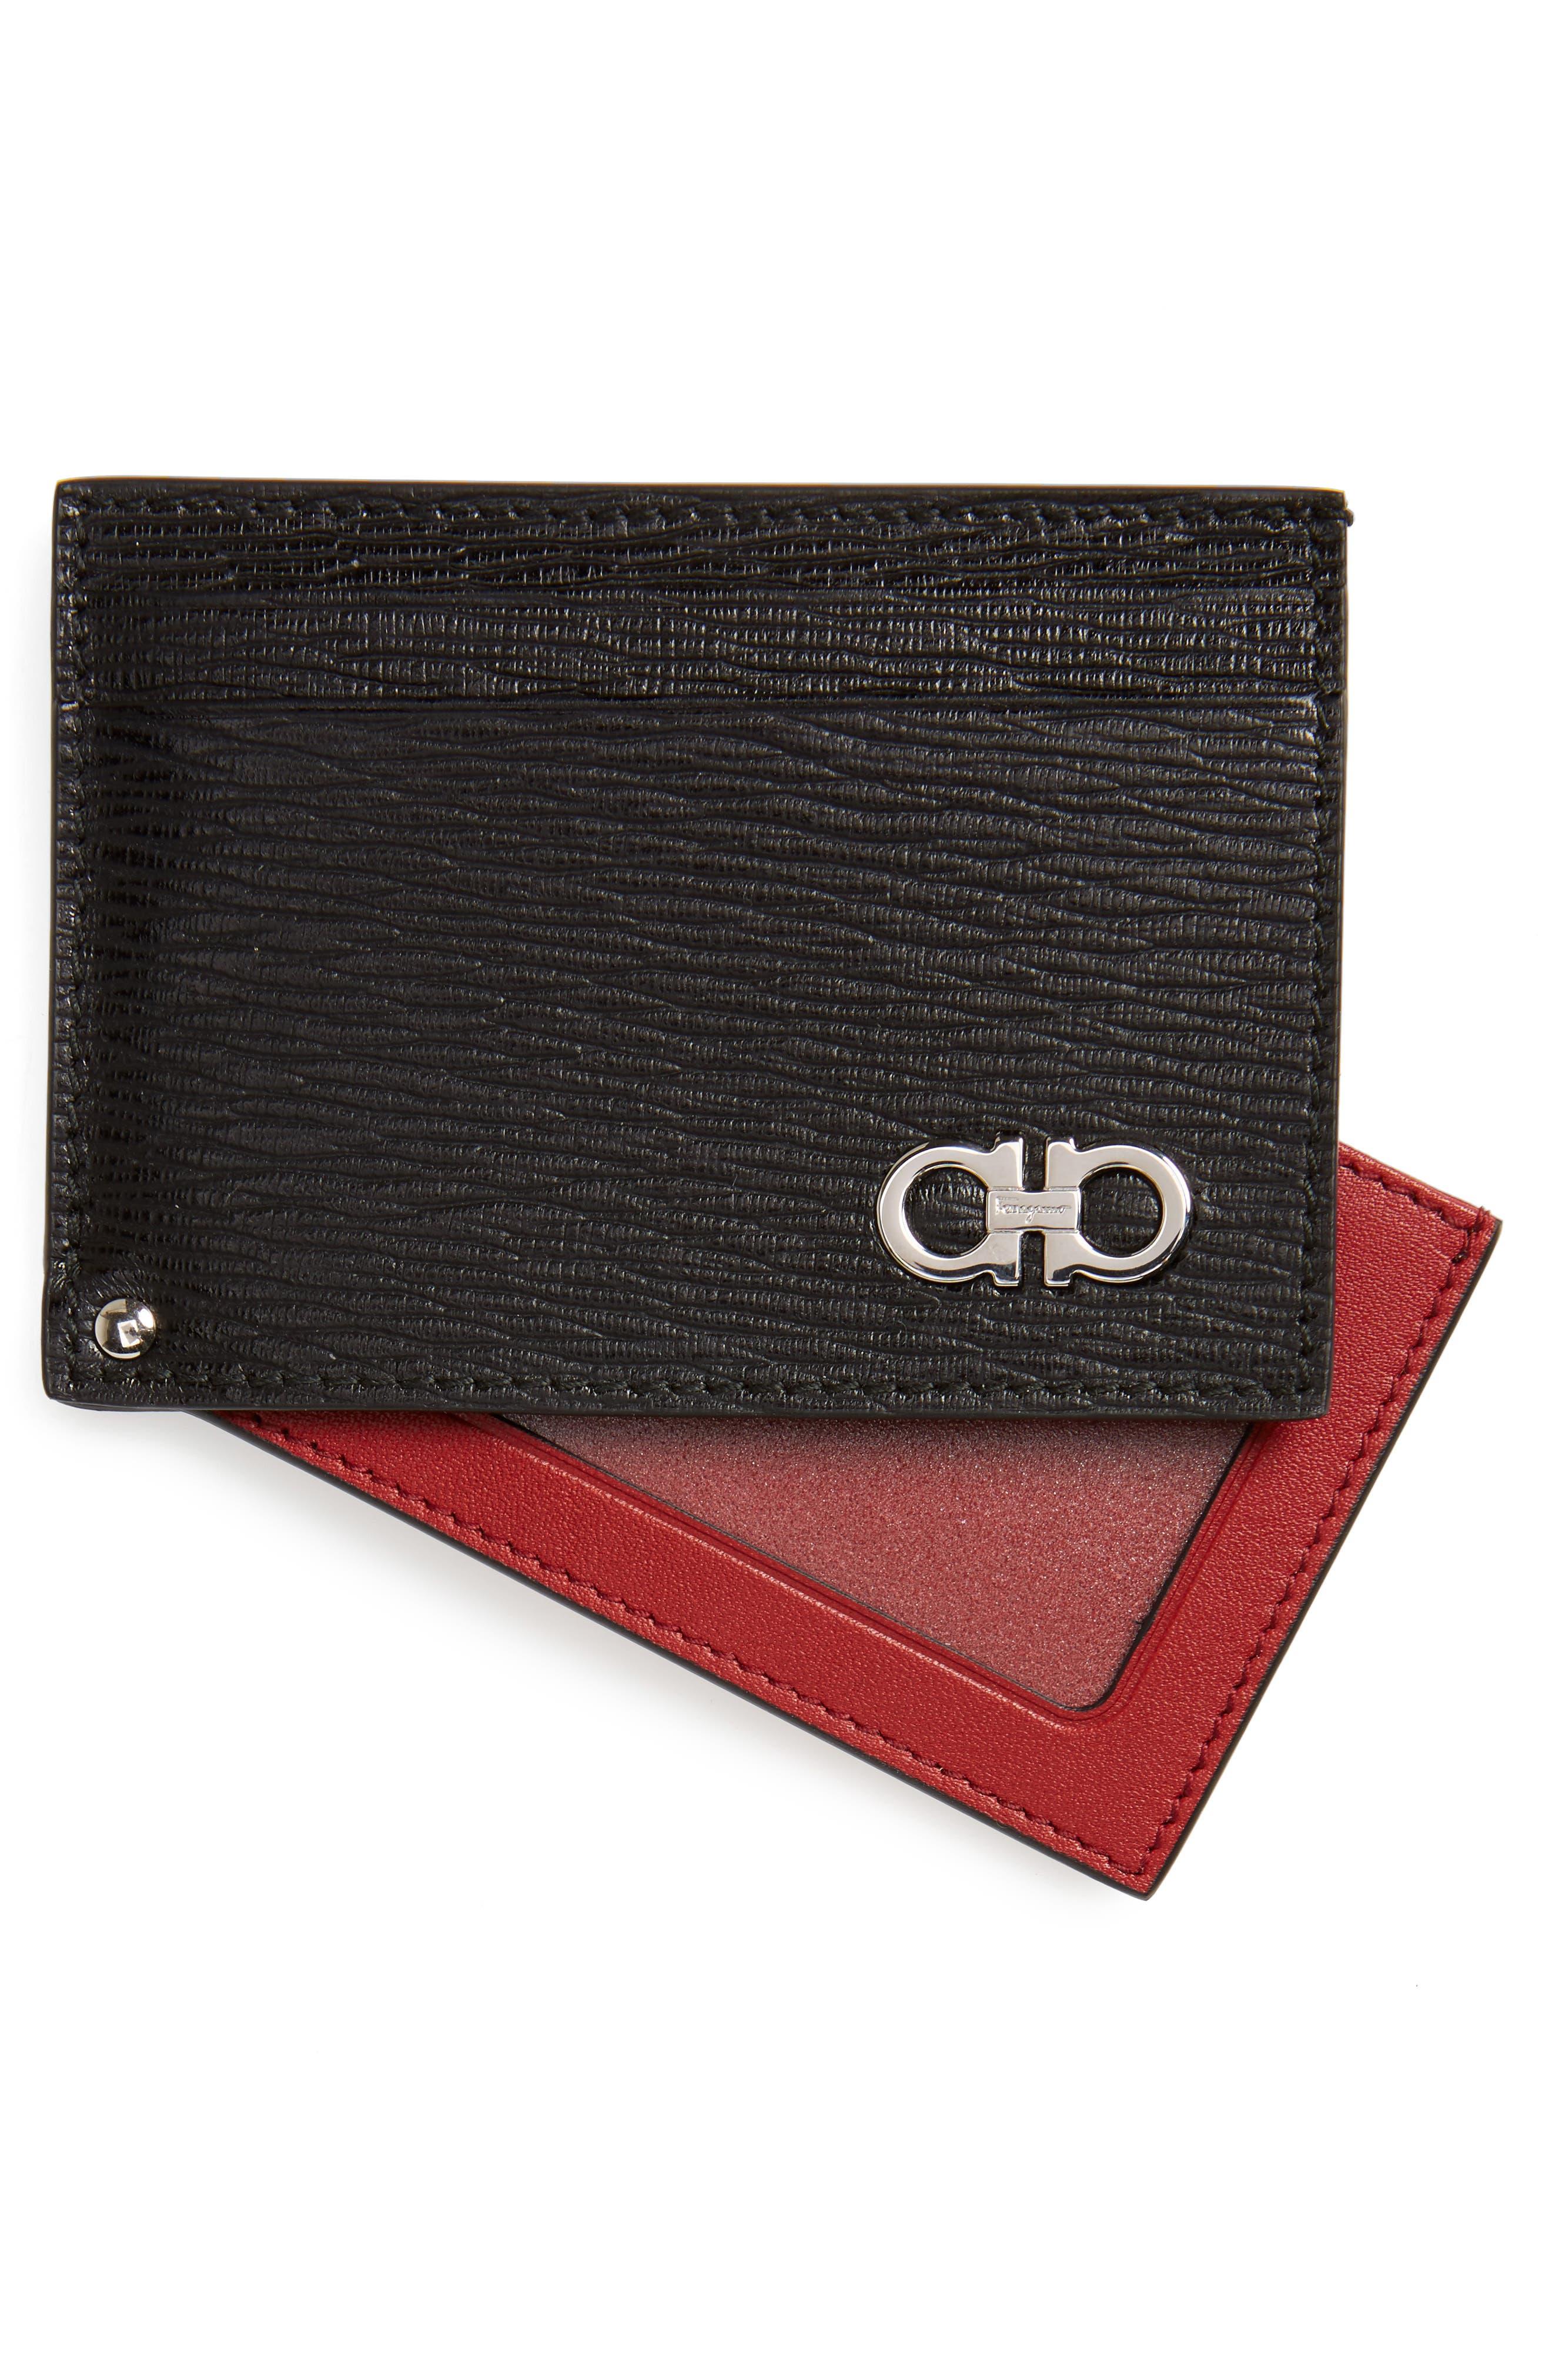 Revival Calfskin Leather Card Case,                             Alternate thumbnail 3, color,                             Black